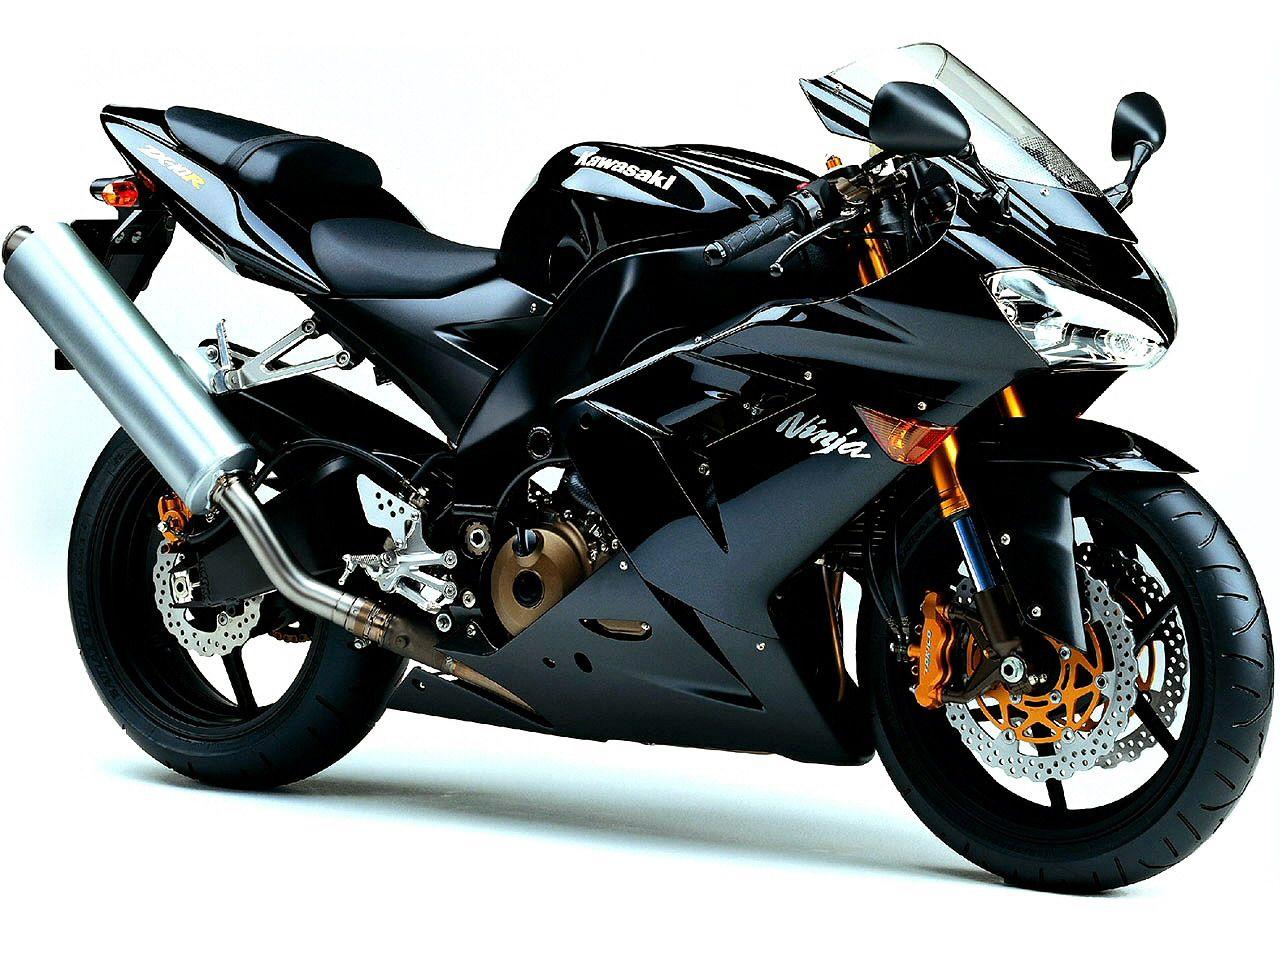 Gambar Motor Sport Dengan Desain Keren Www Coolpicturegallery Us